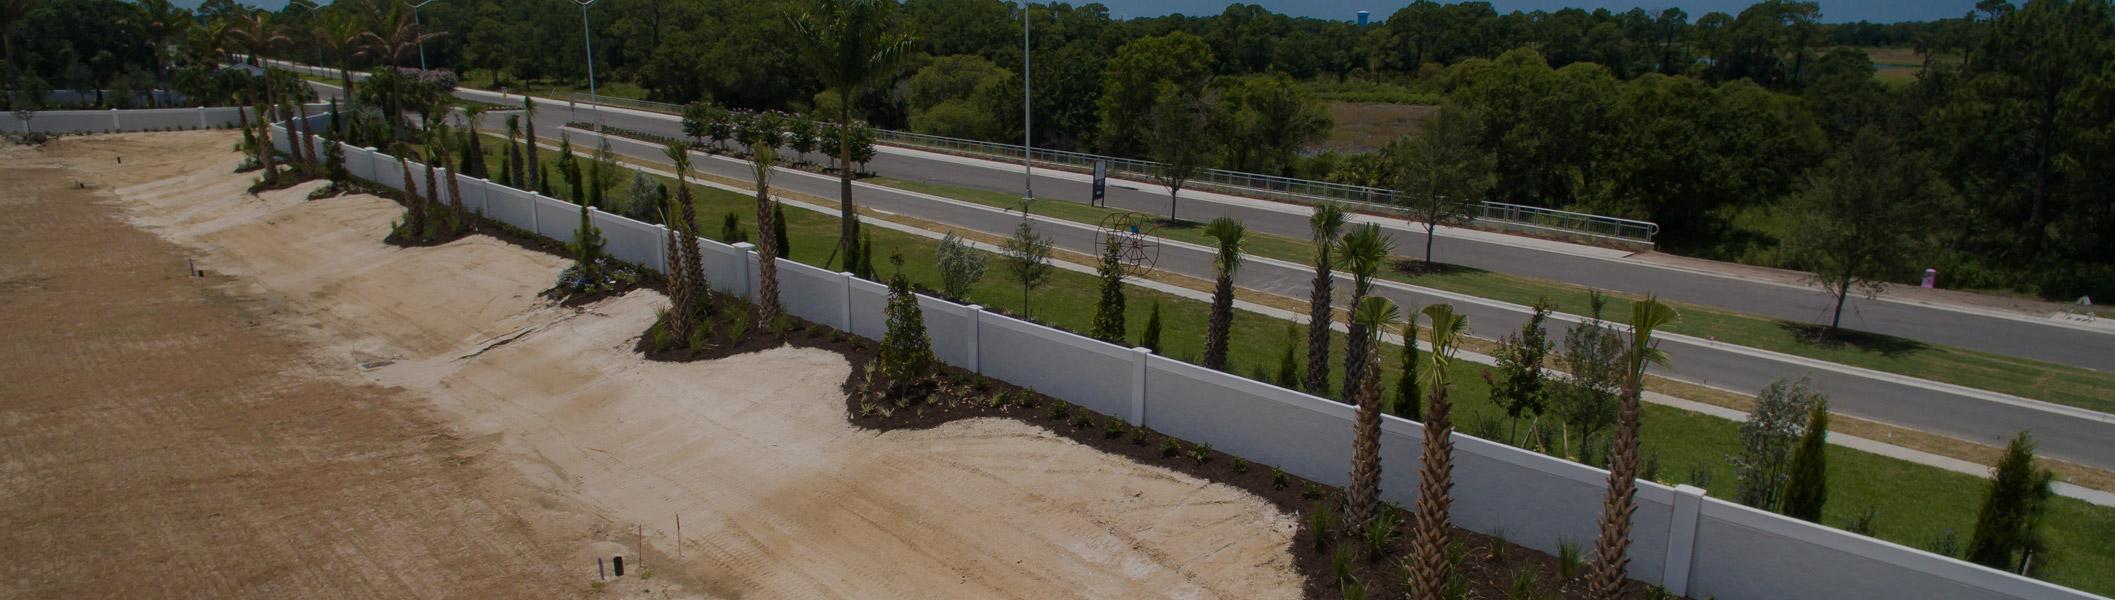 Permacast precast concrete fencing faq permacast walls for Permacast columns pricing